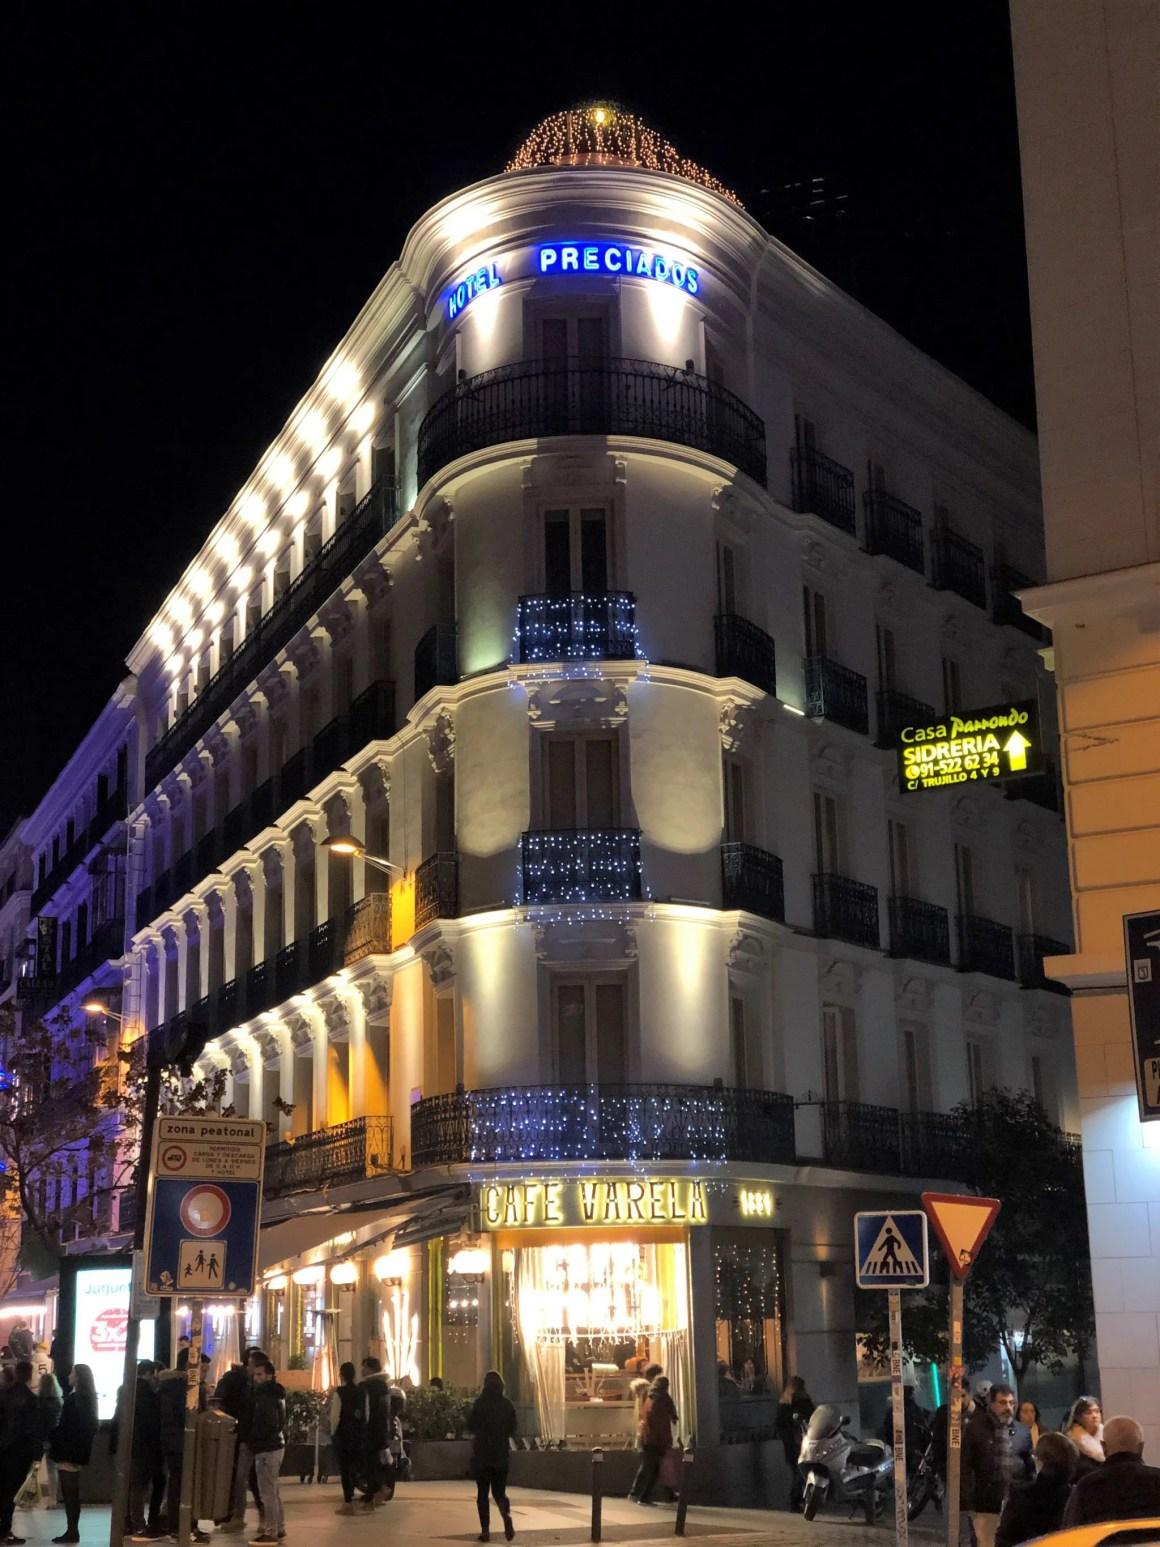 Cafe Valera Madrid